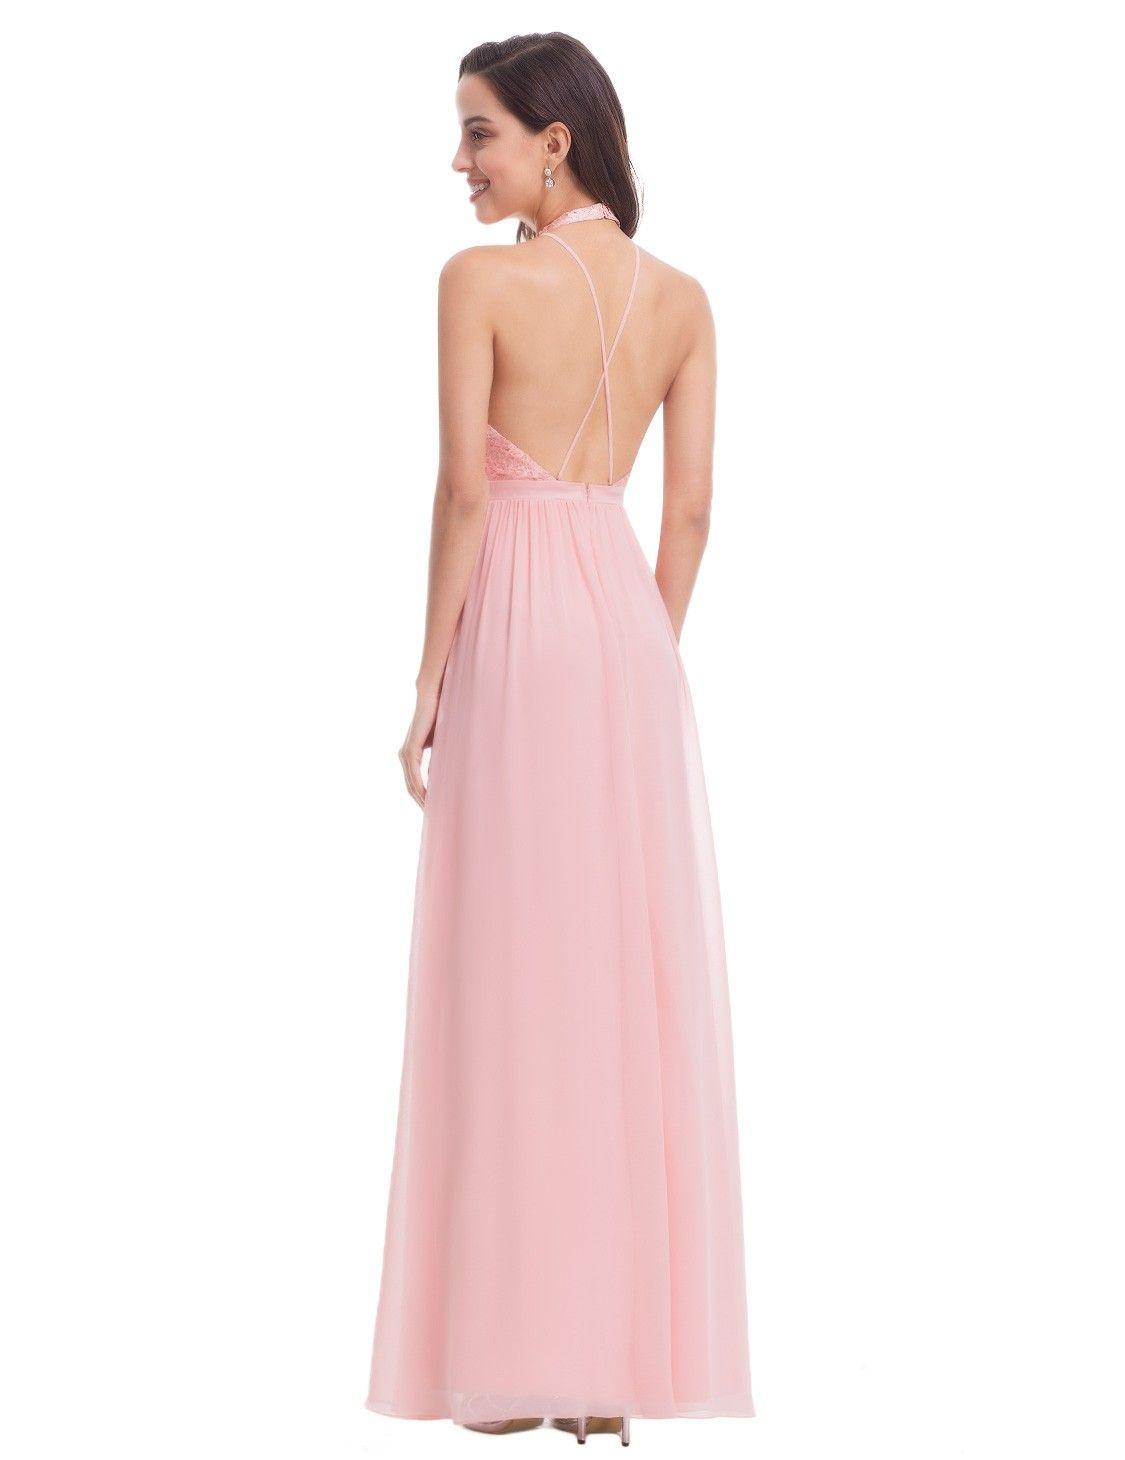 Long halter neck prom dress with deep v pinterest halter neck